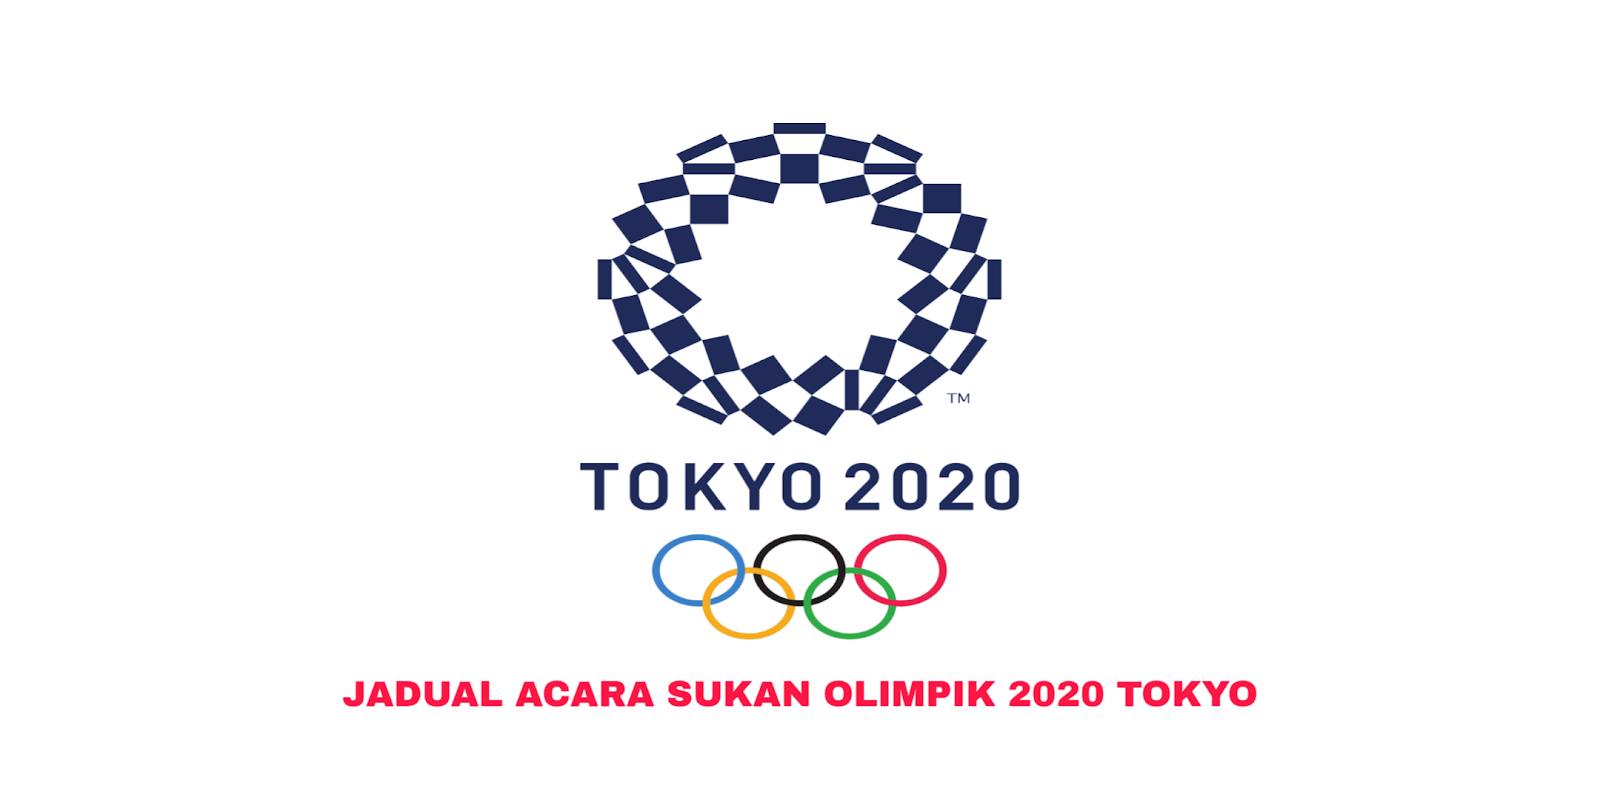 Jadual Acara Sukan Olimpik 2020 Malaysia